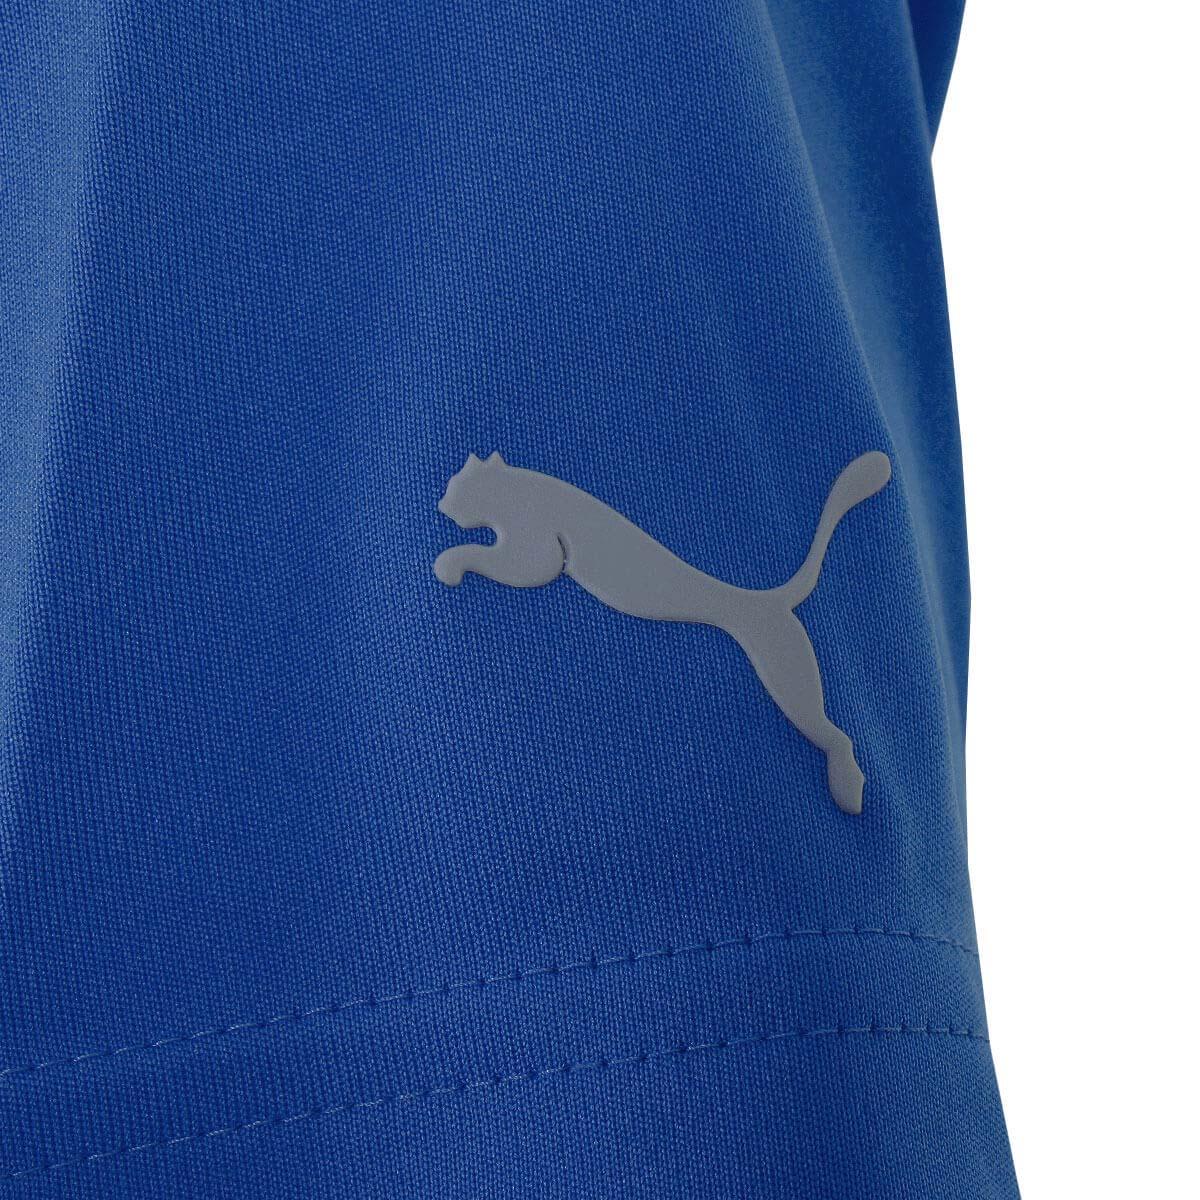 Puma-Golf-Mens-Essential-Pounce-Cresting-DryCell-Tech-Polo-Shirt-46-OFF-RRP thumbnail 29